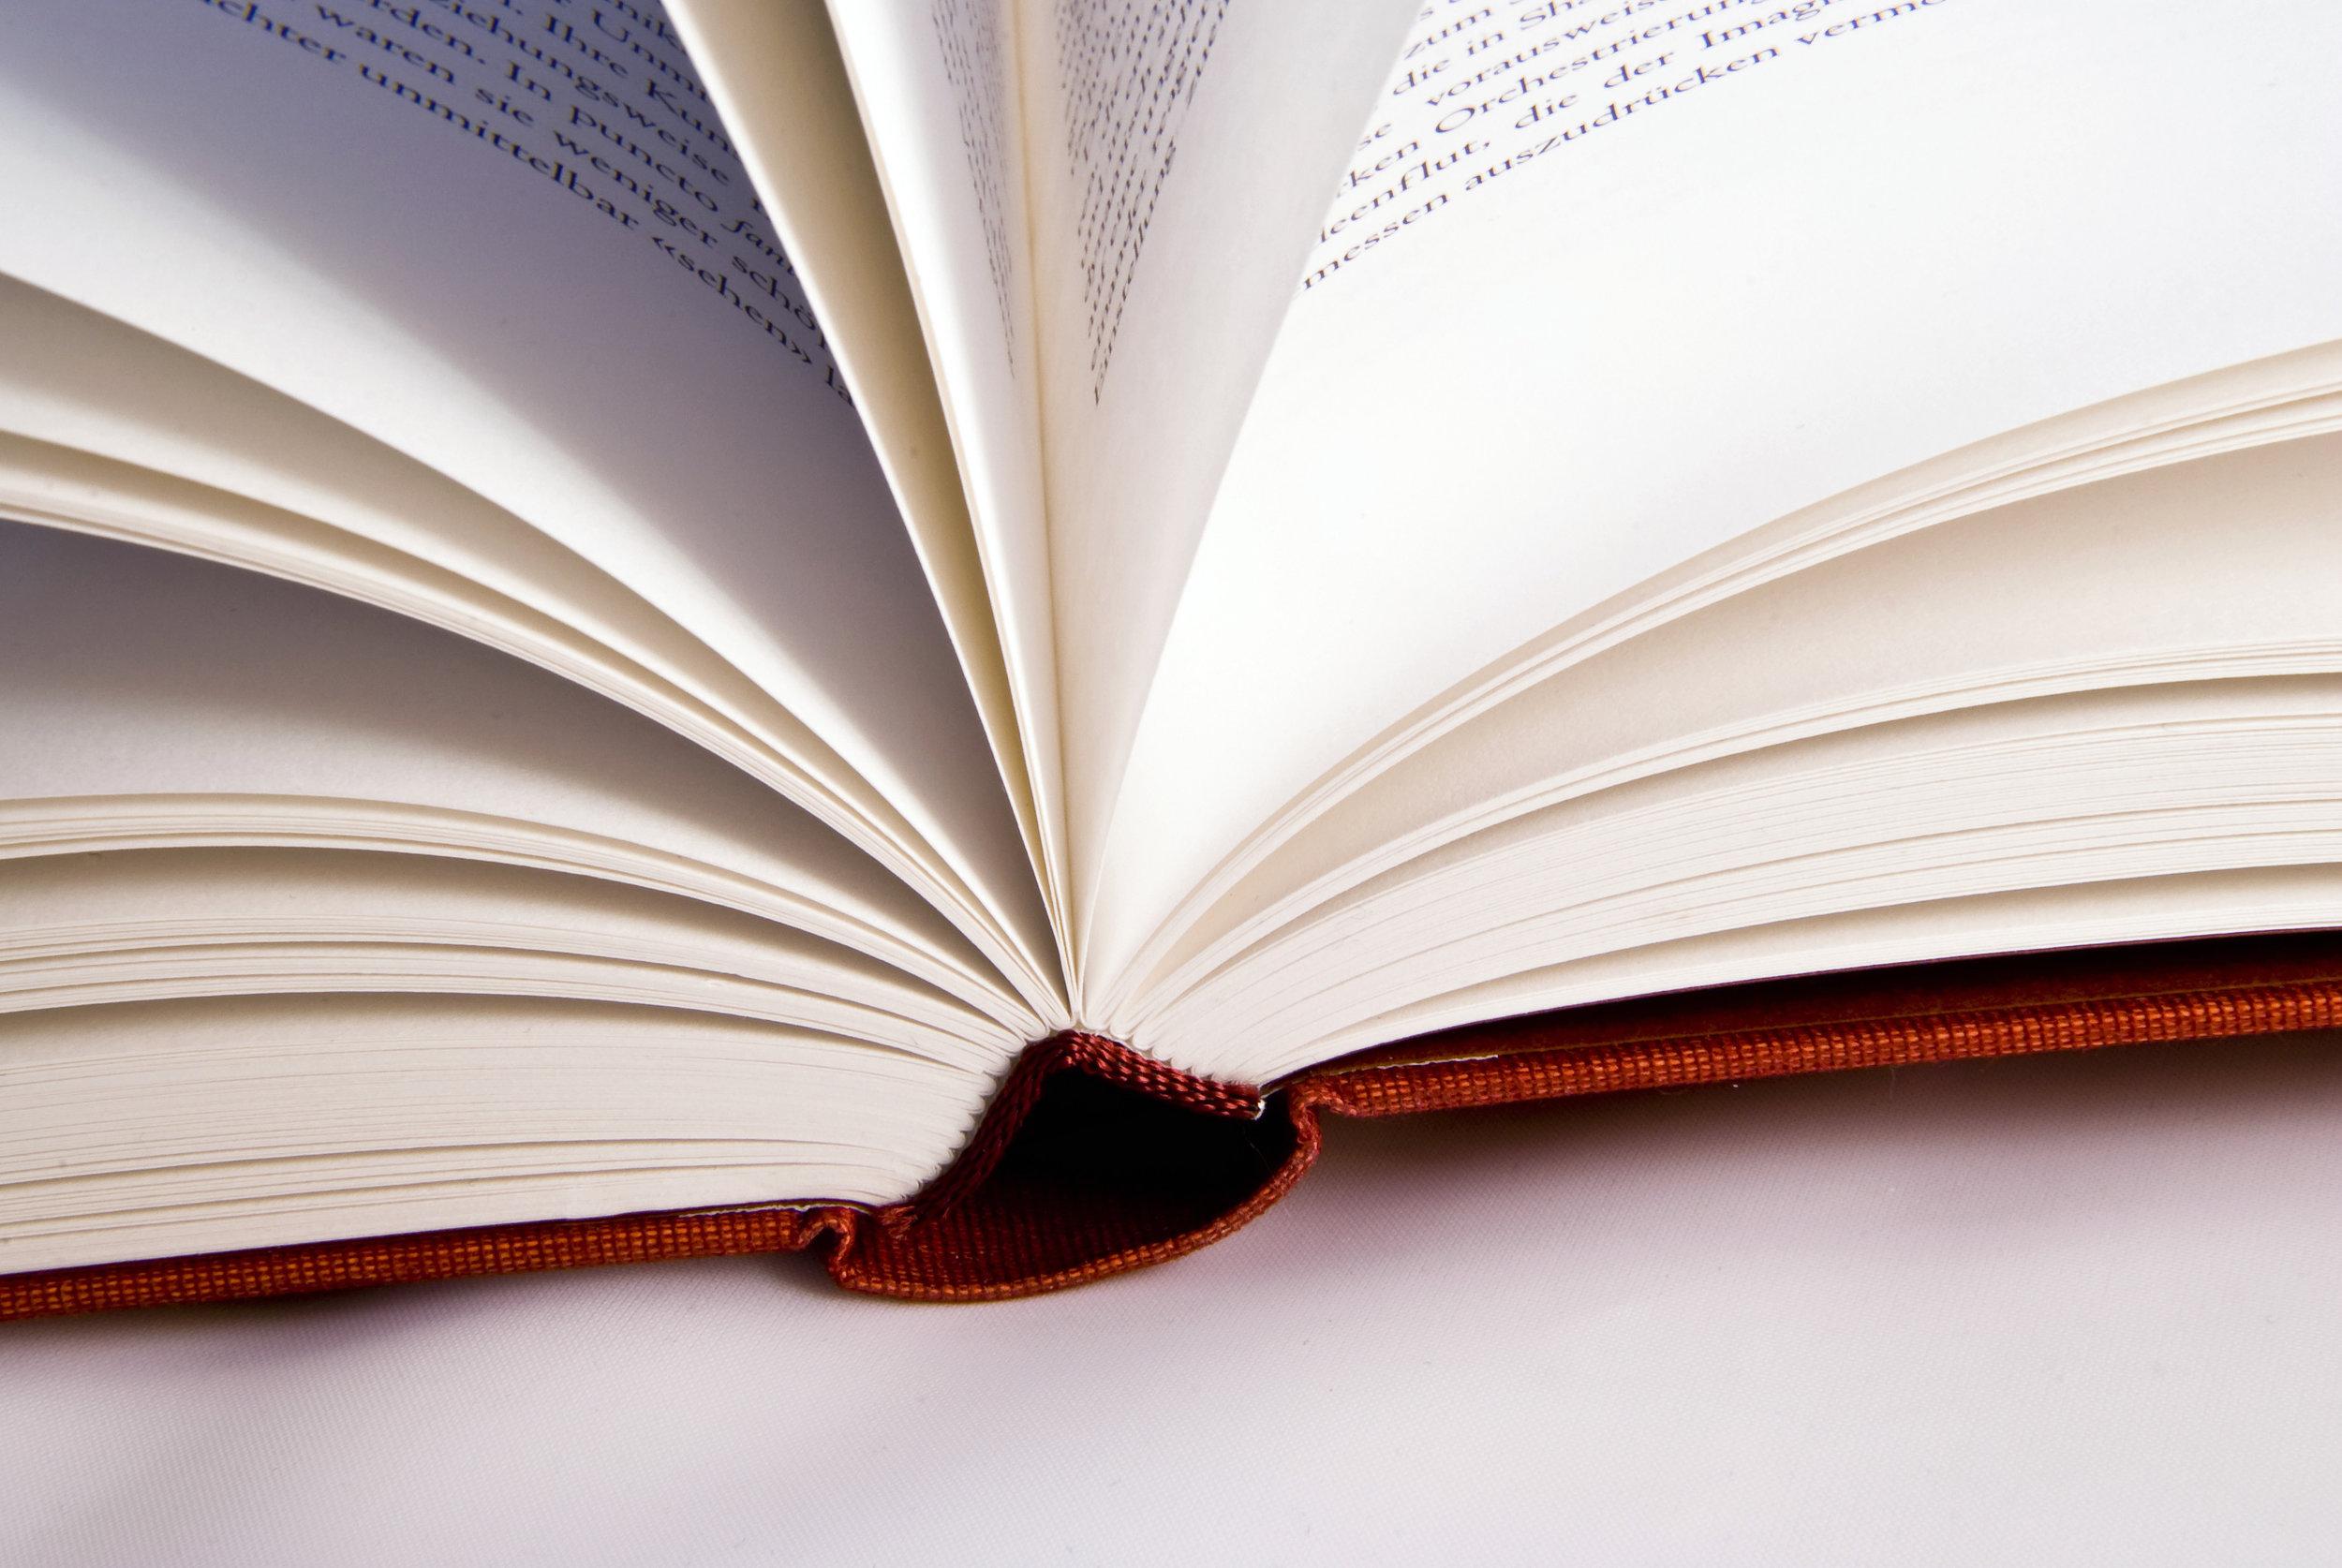 book_M1We2Bcu (1).jpg